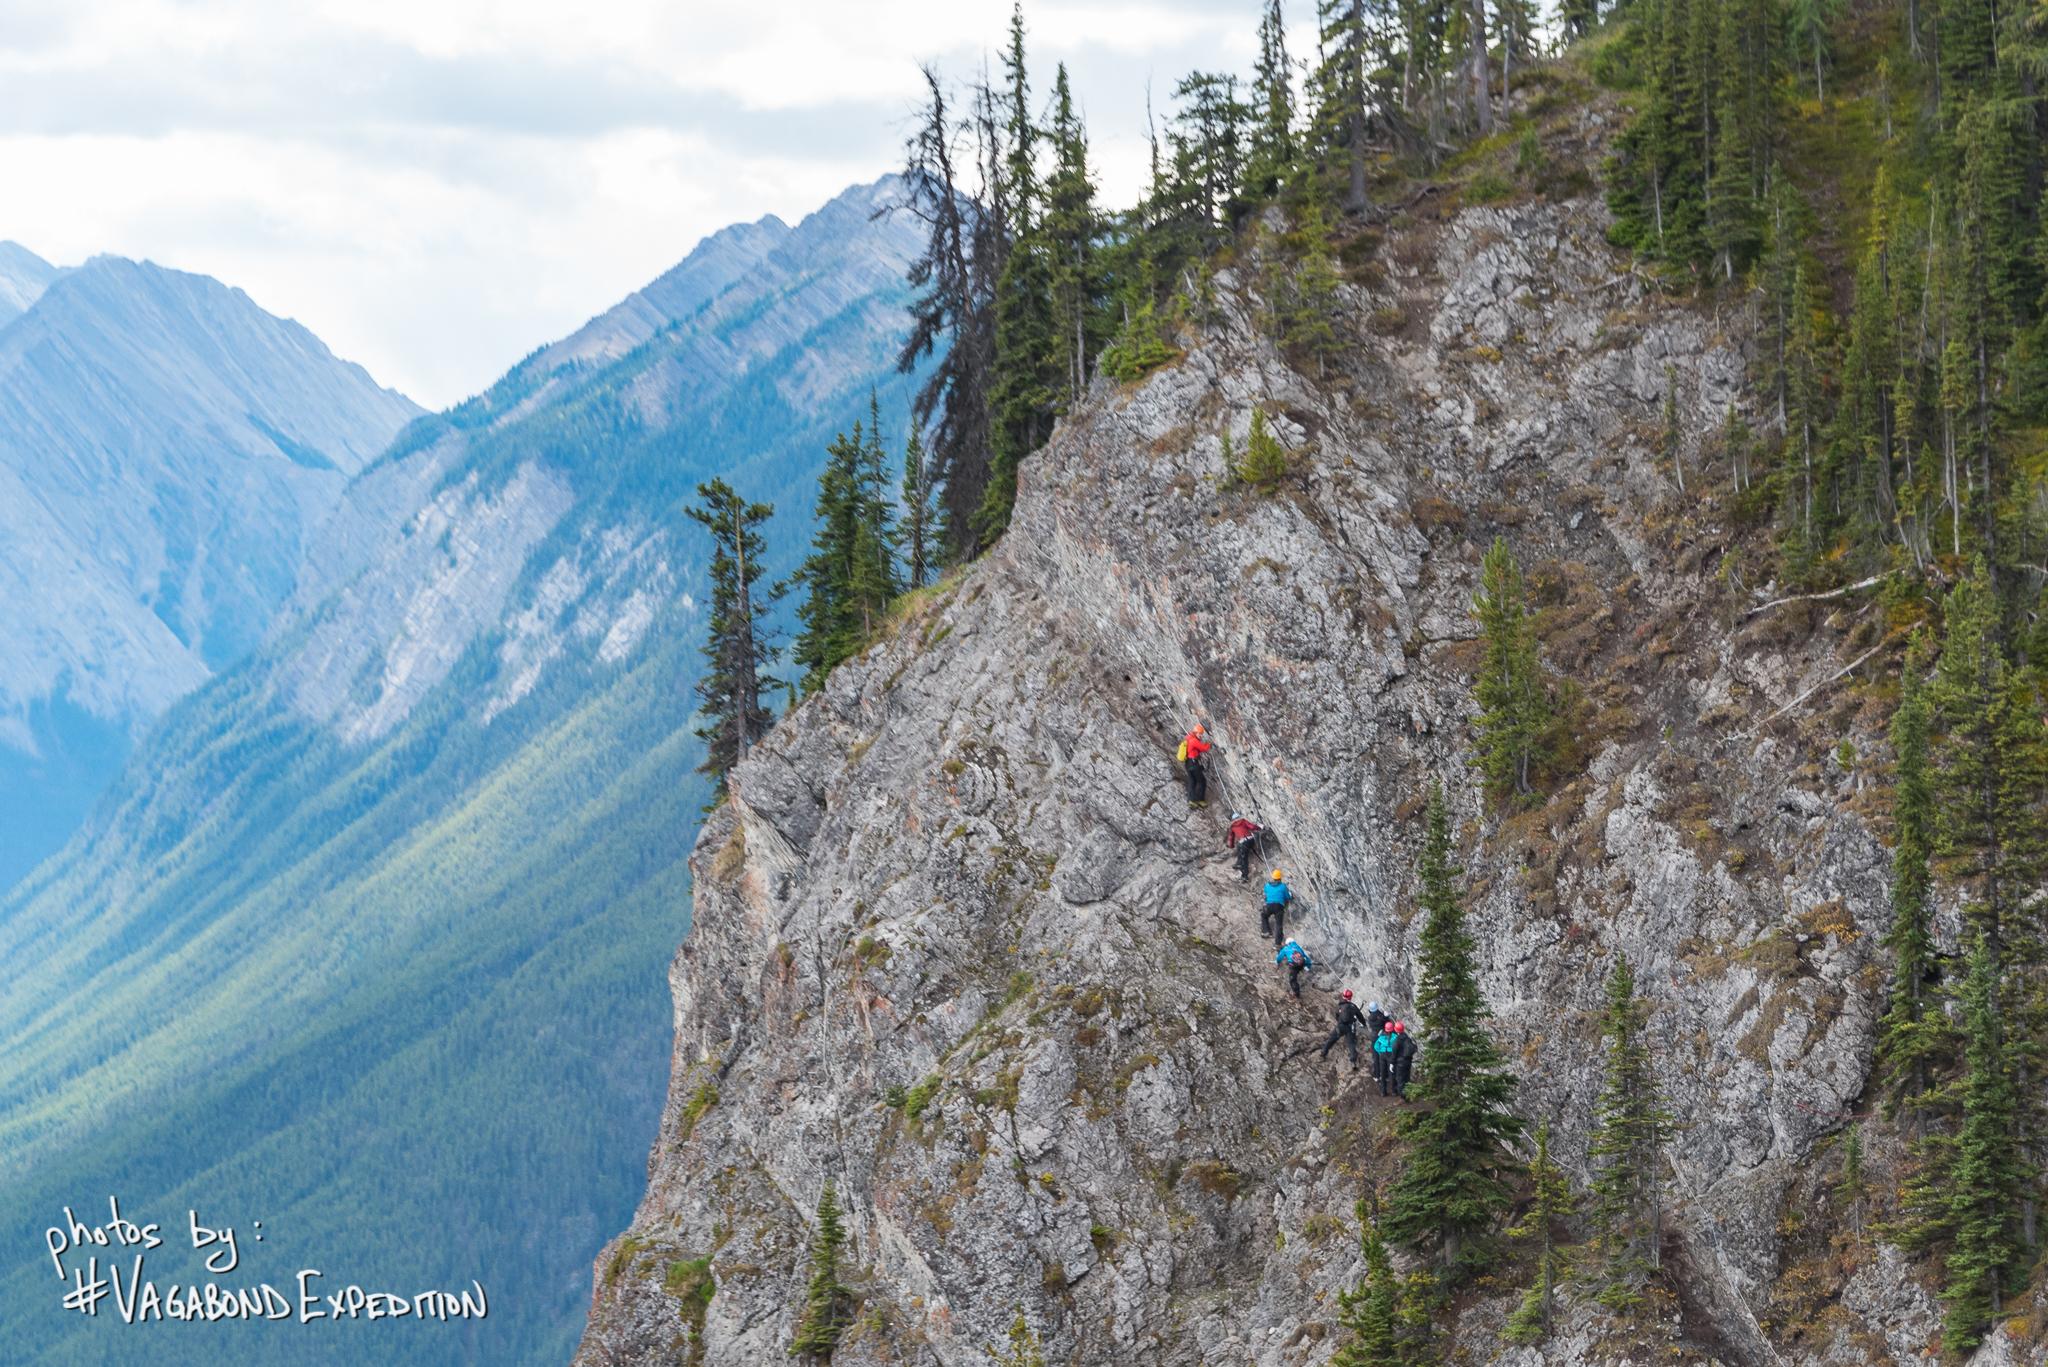 Climbing the Mt Norquay ViaFerrata